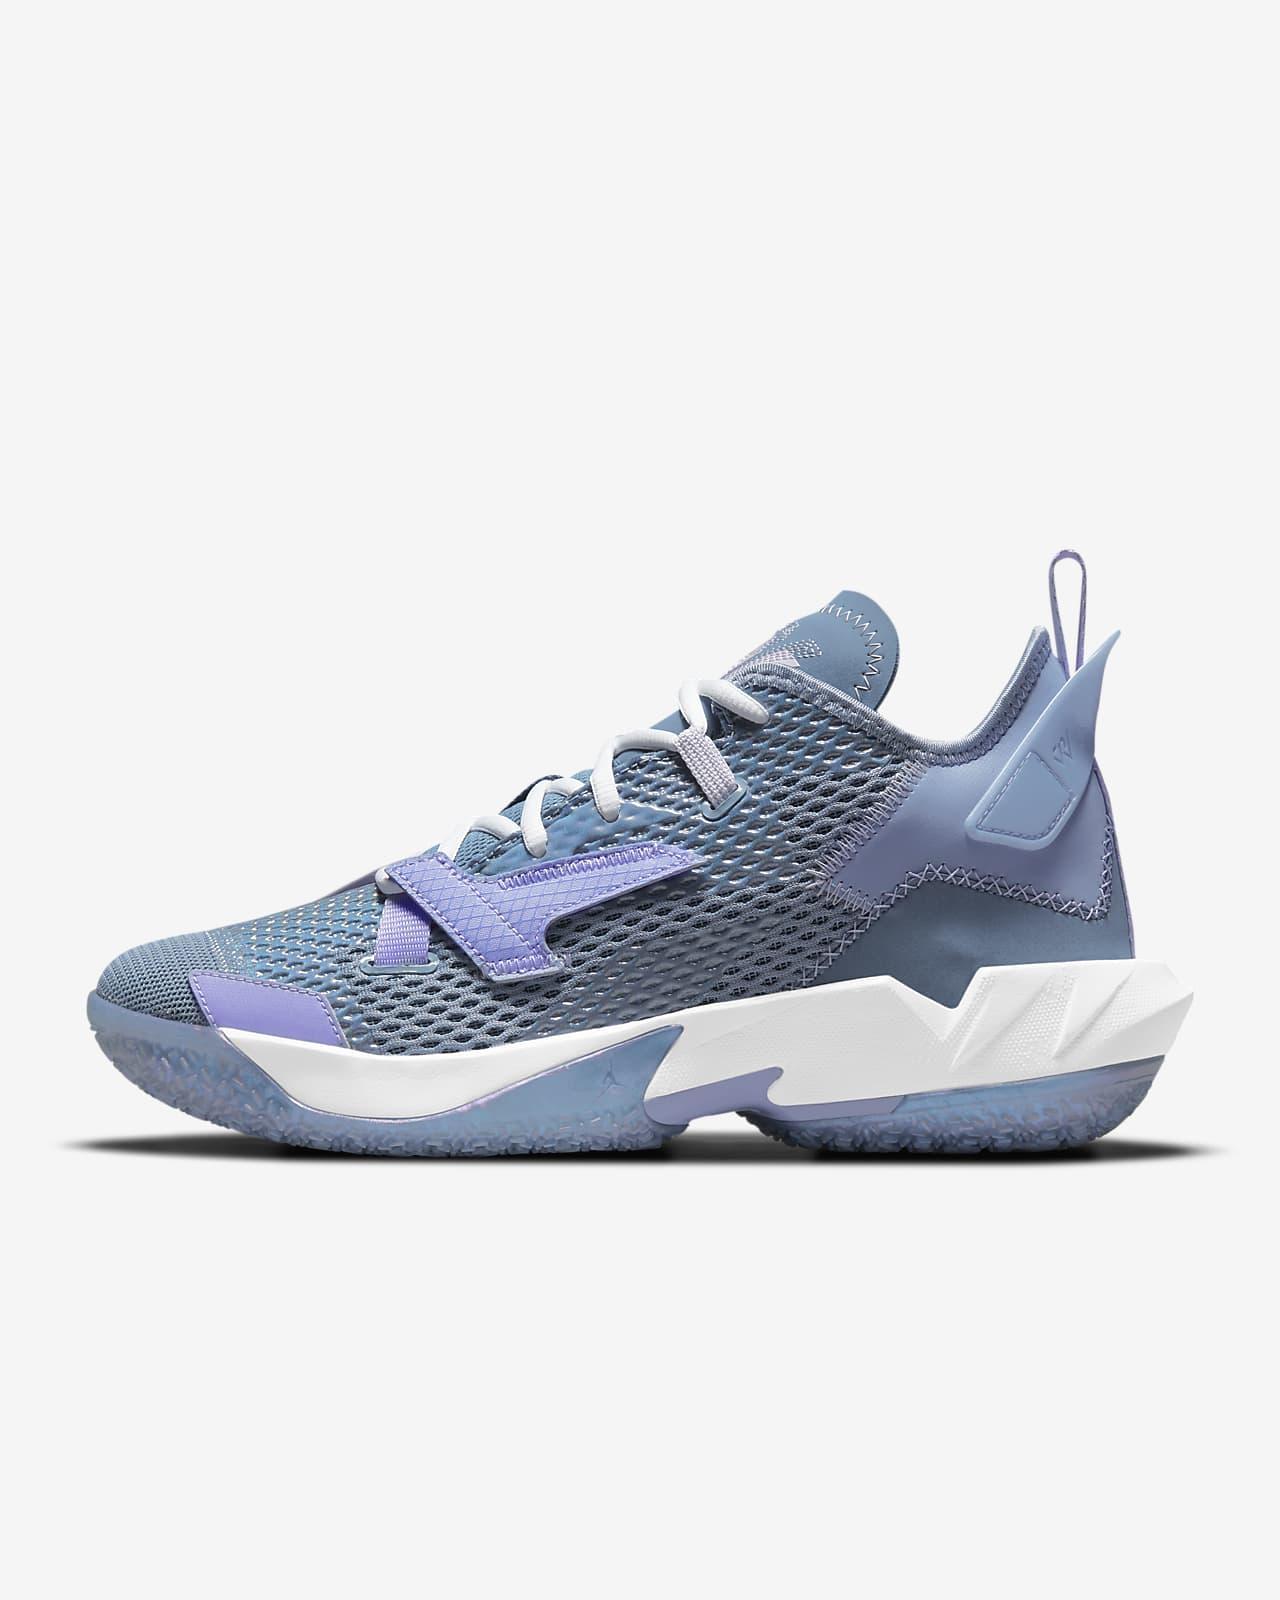 Jordan 'Why Not?' Zer0.4 Basketball Shoes